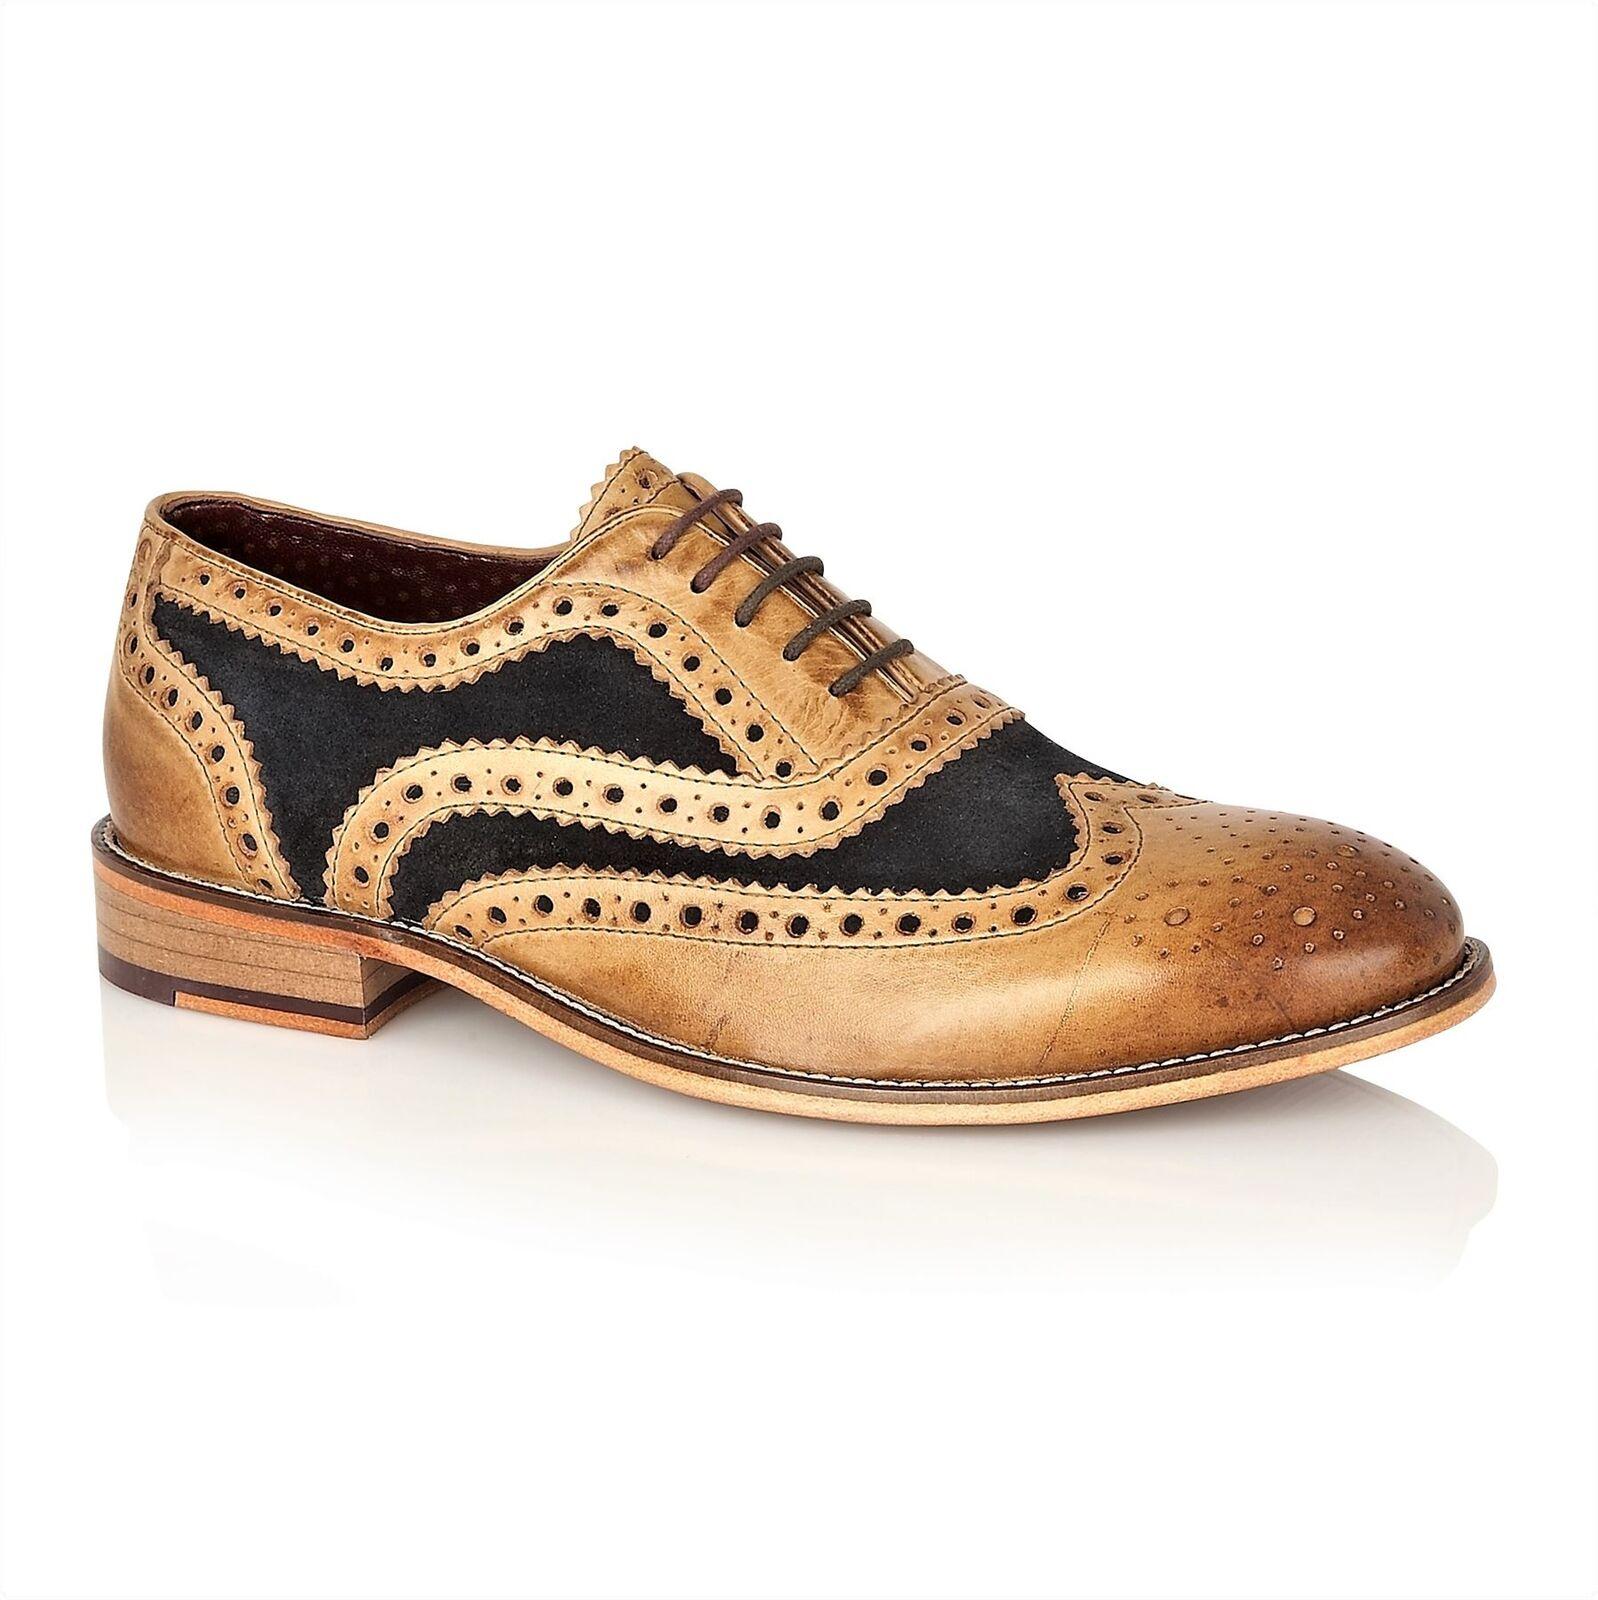 London Brogues Watson Ledersohle Herren Schnürschuhe Formal Schuhe Hell